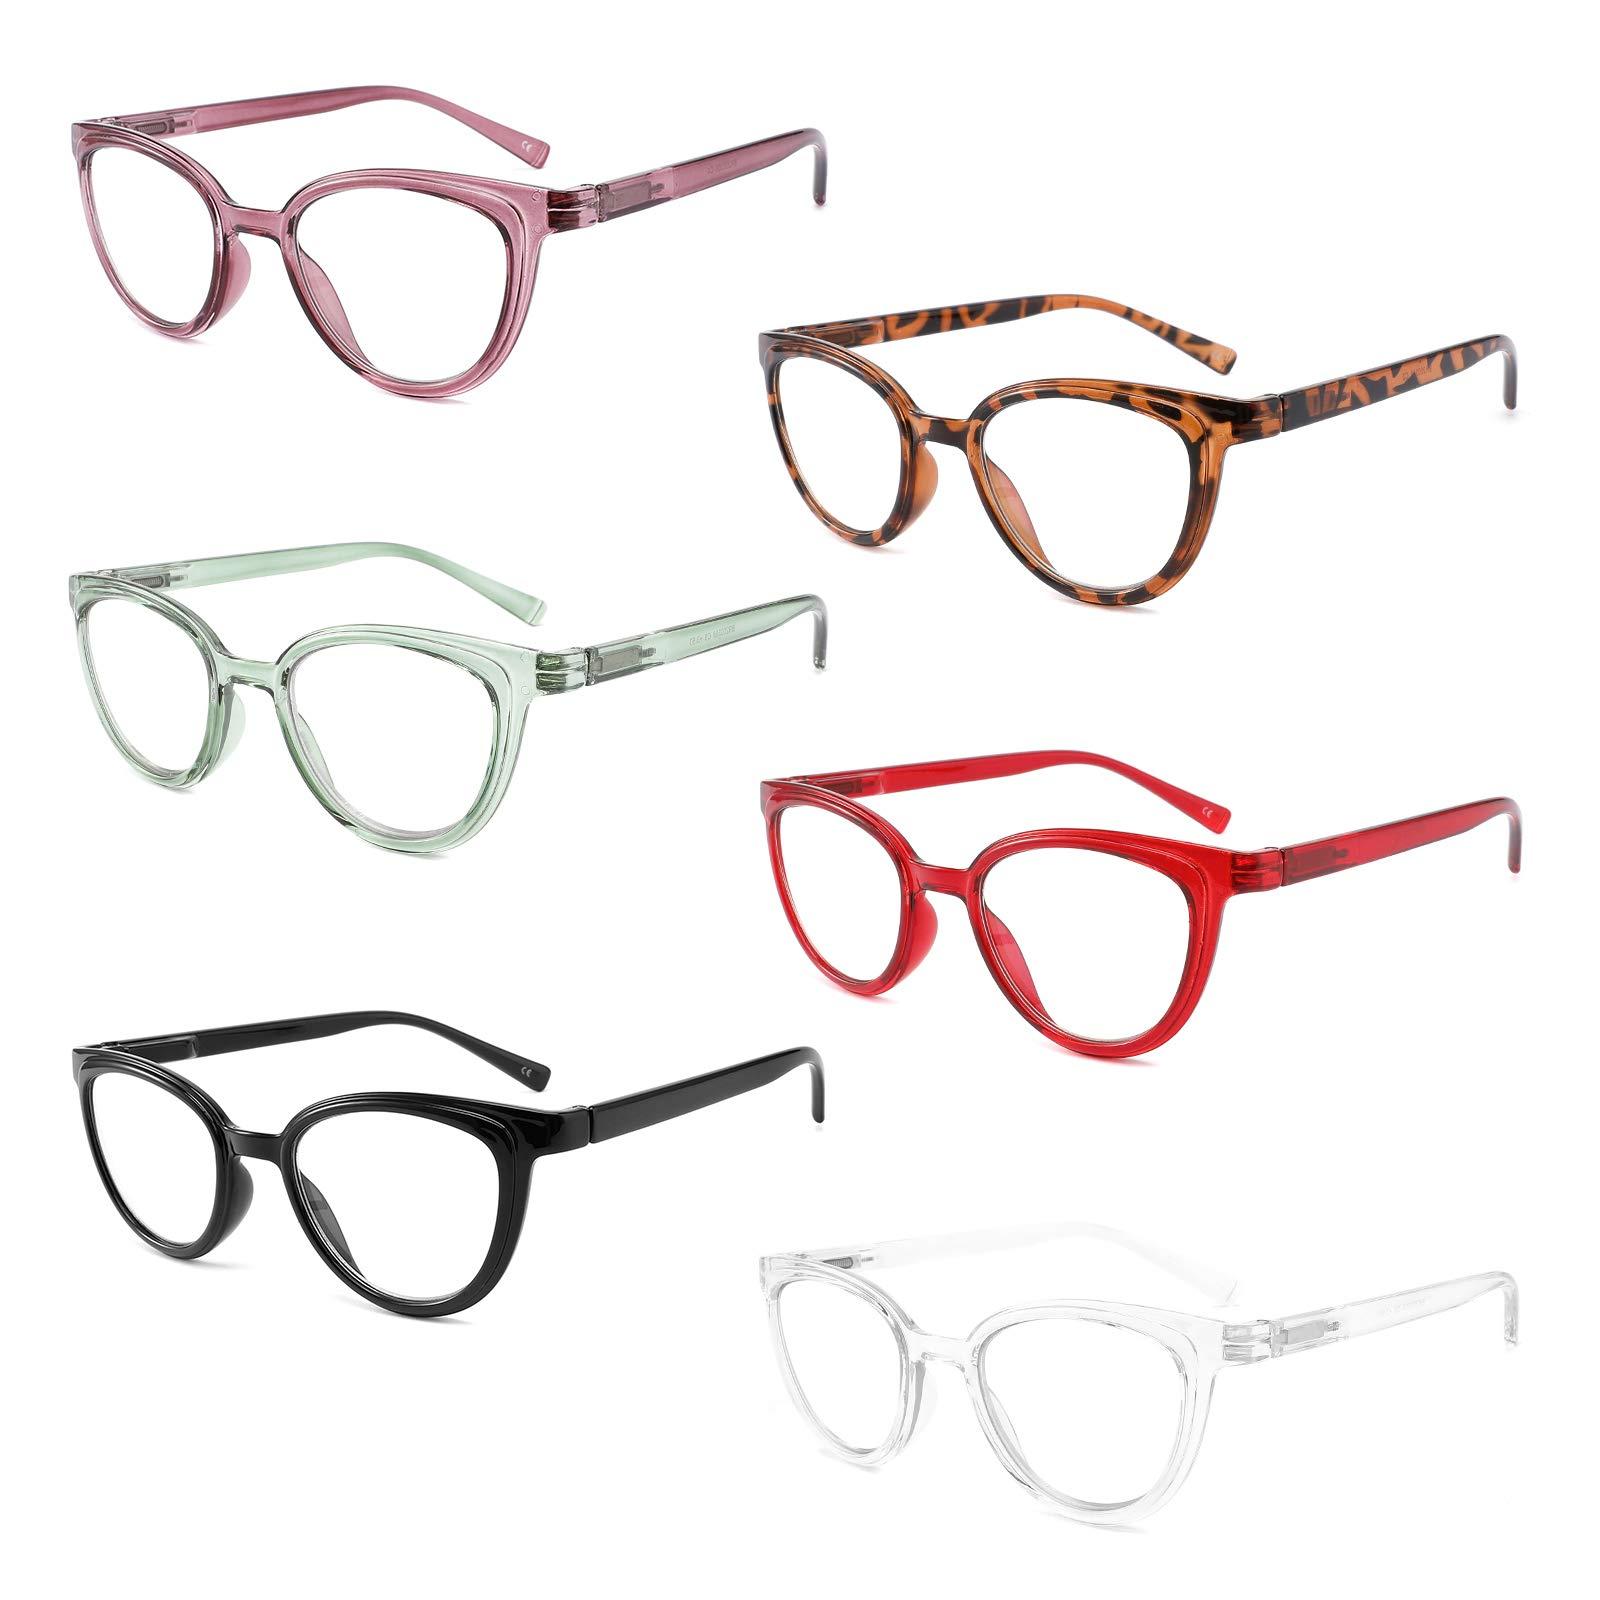 IVNUOYI 6 Pack Reading Glasses Blue Light Blocking Stylish Ladies Readers with Spring Hinges,Anti Glare UV Eyestrain,Computer Eyeglasses for Women 1.0